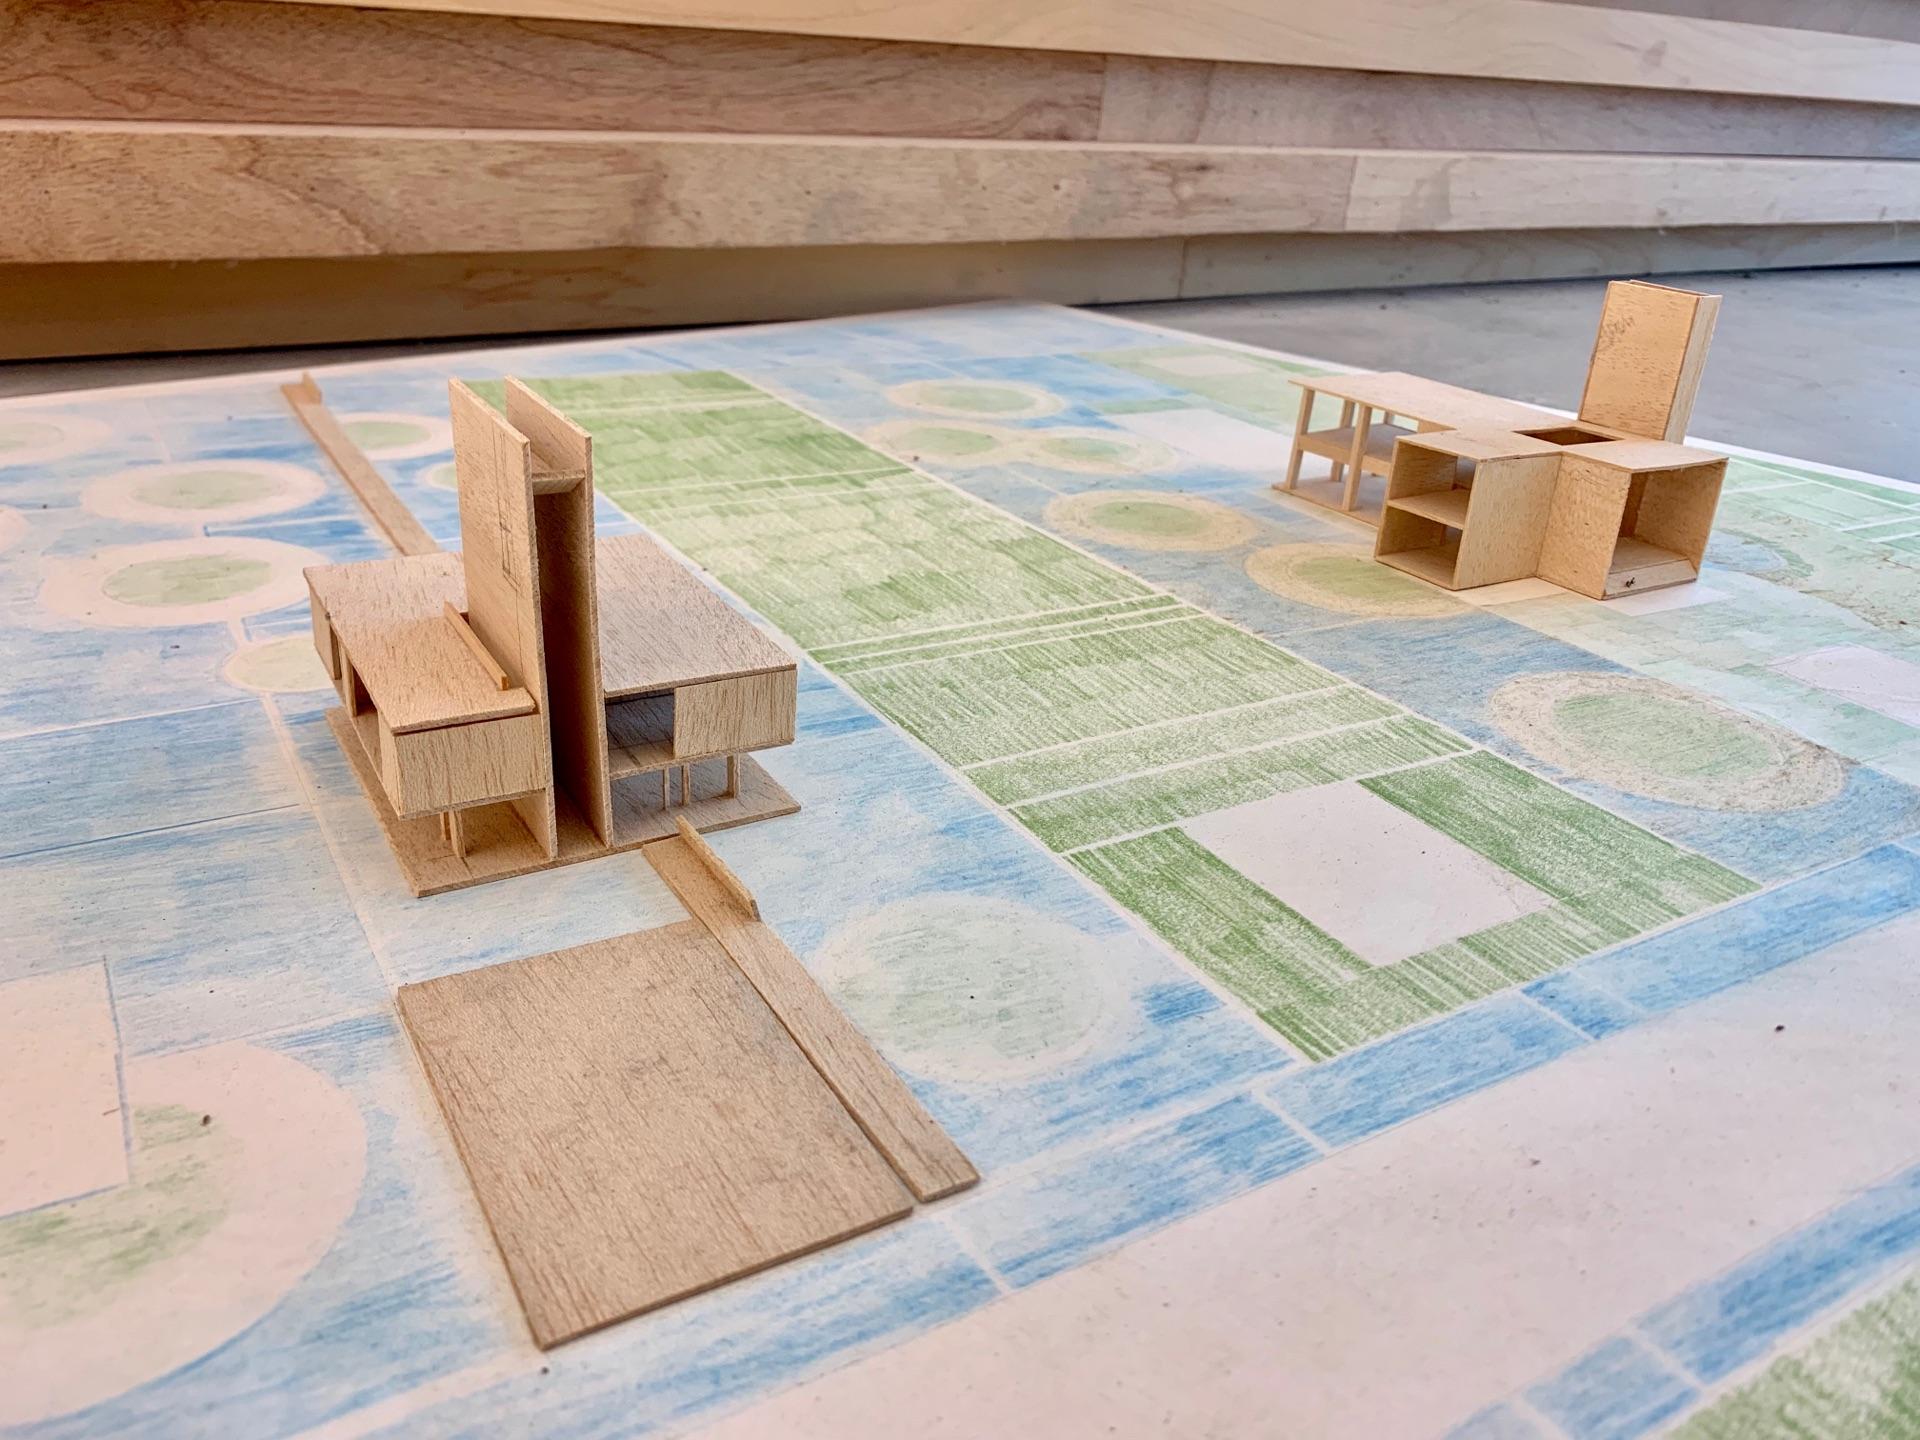 德築-DEZU-project-日光綠築-architecture-building-model-2